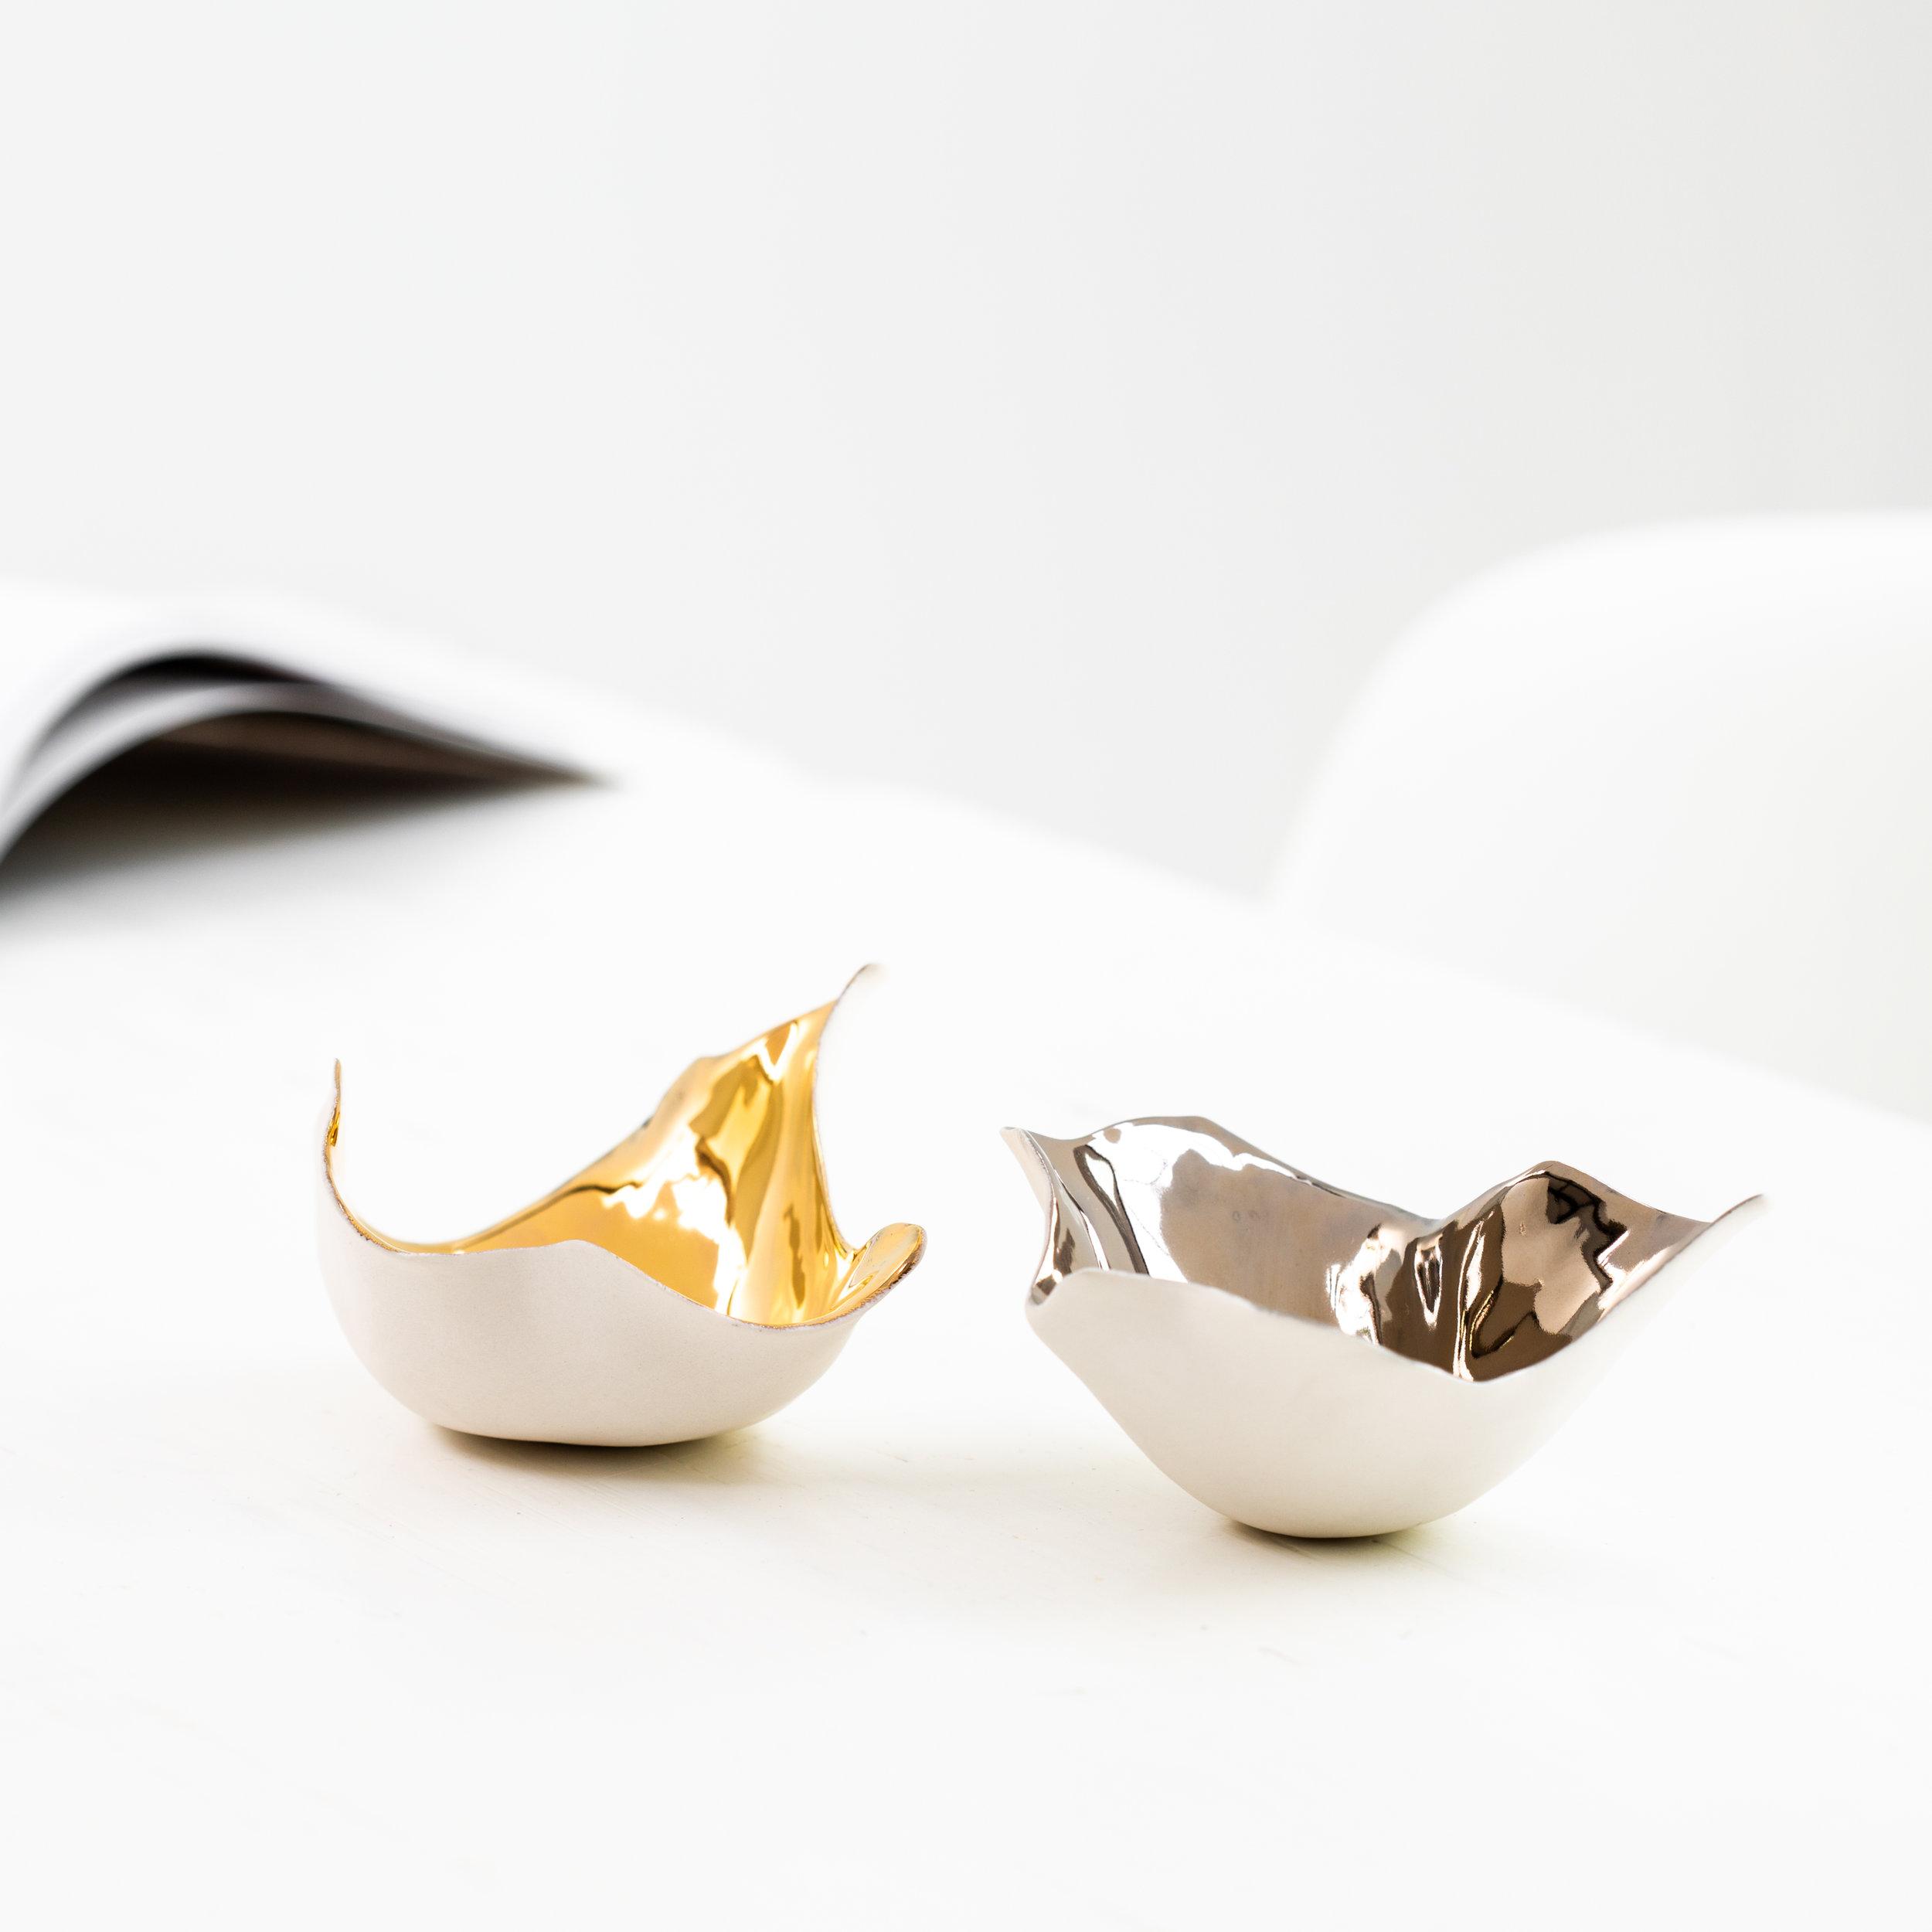 Penny Little Ceramics 1.jpg